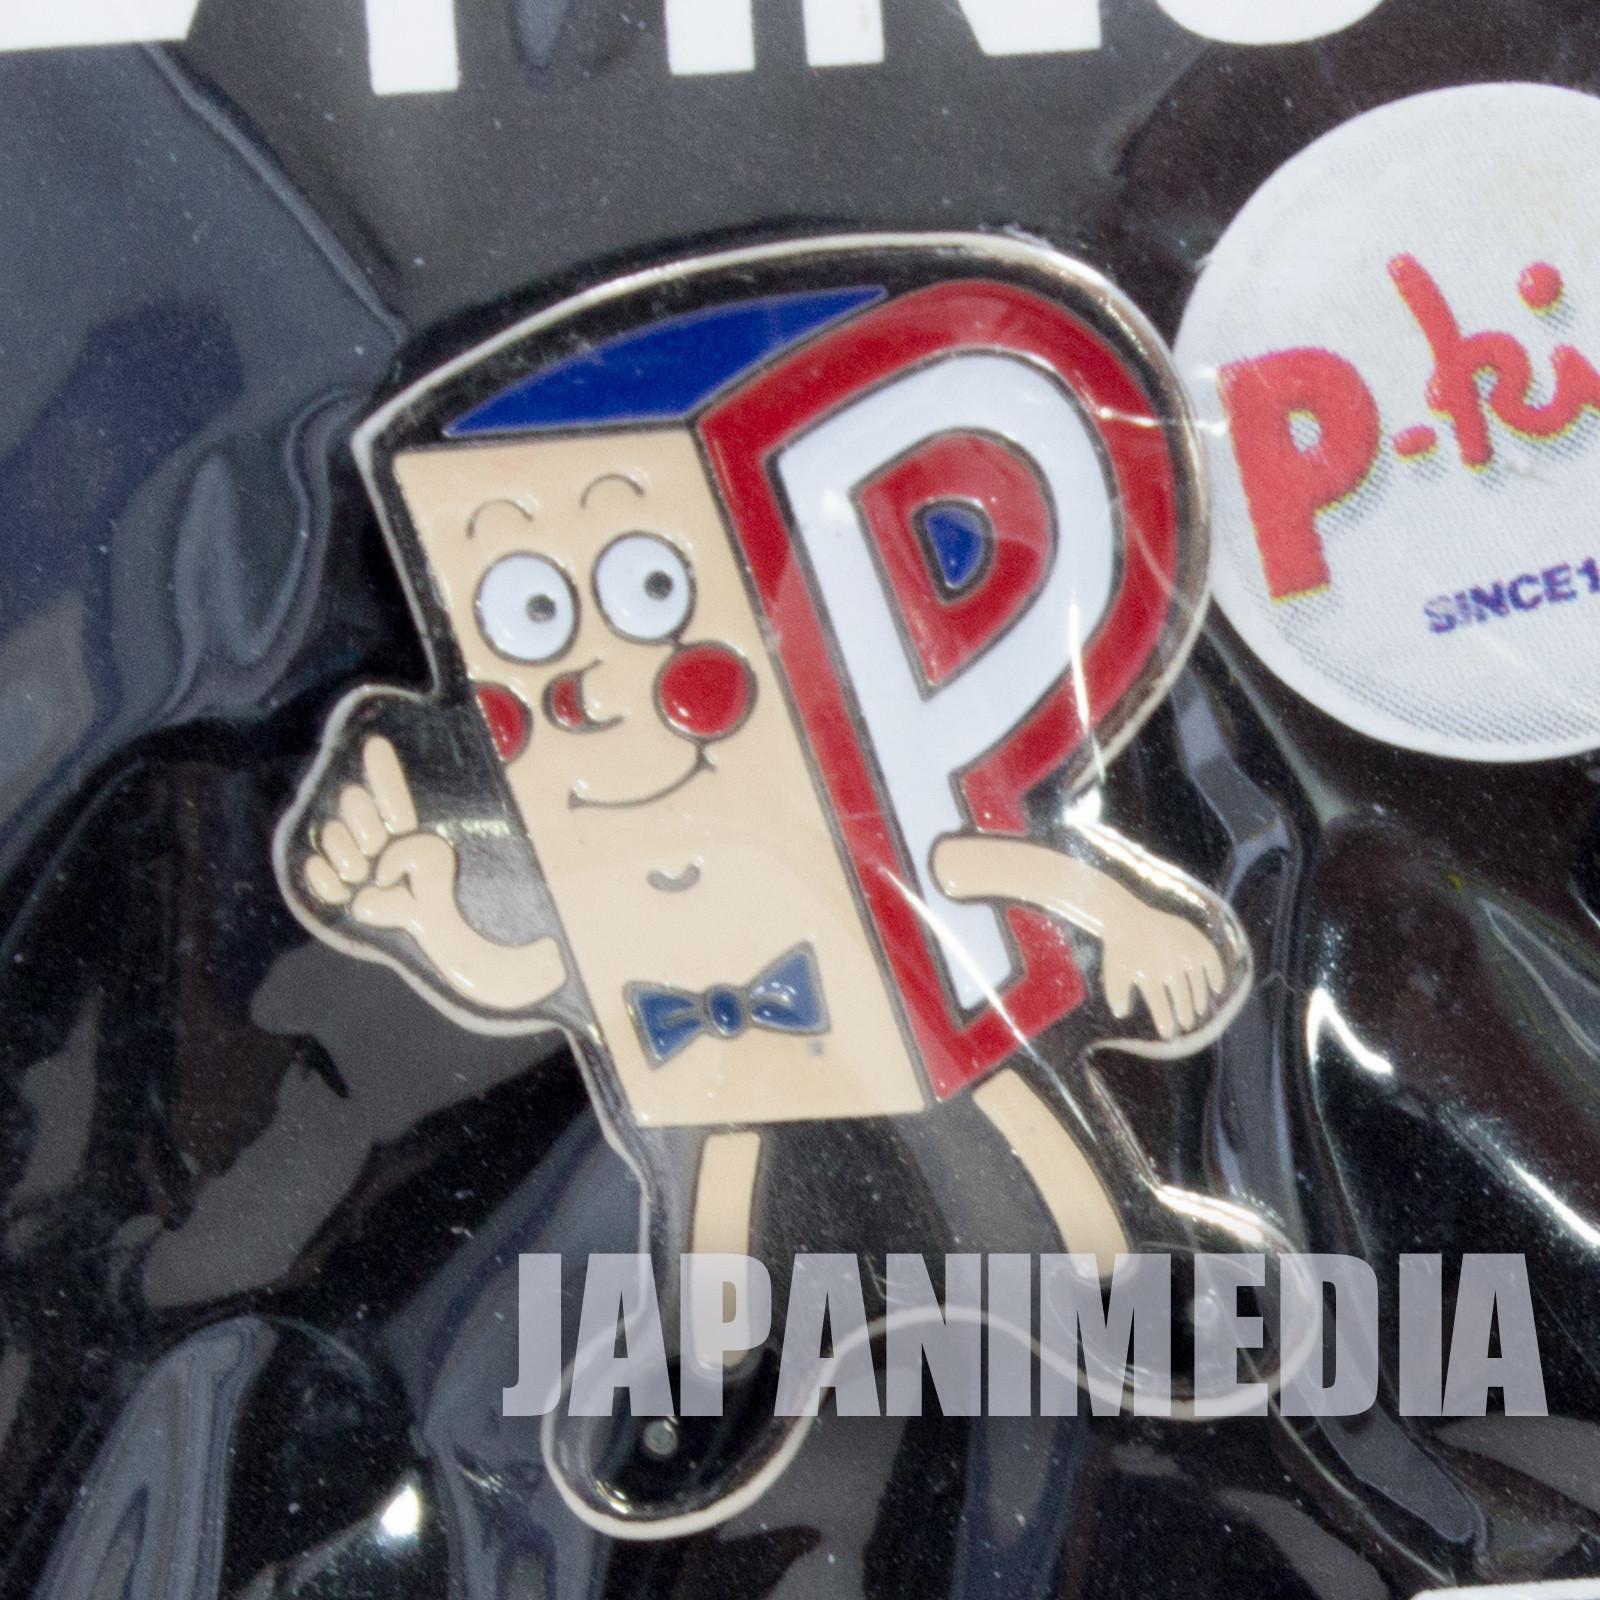 Ponkickies P-kies P-chan Metal Pins JAPAN Ponkikki